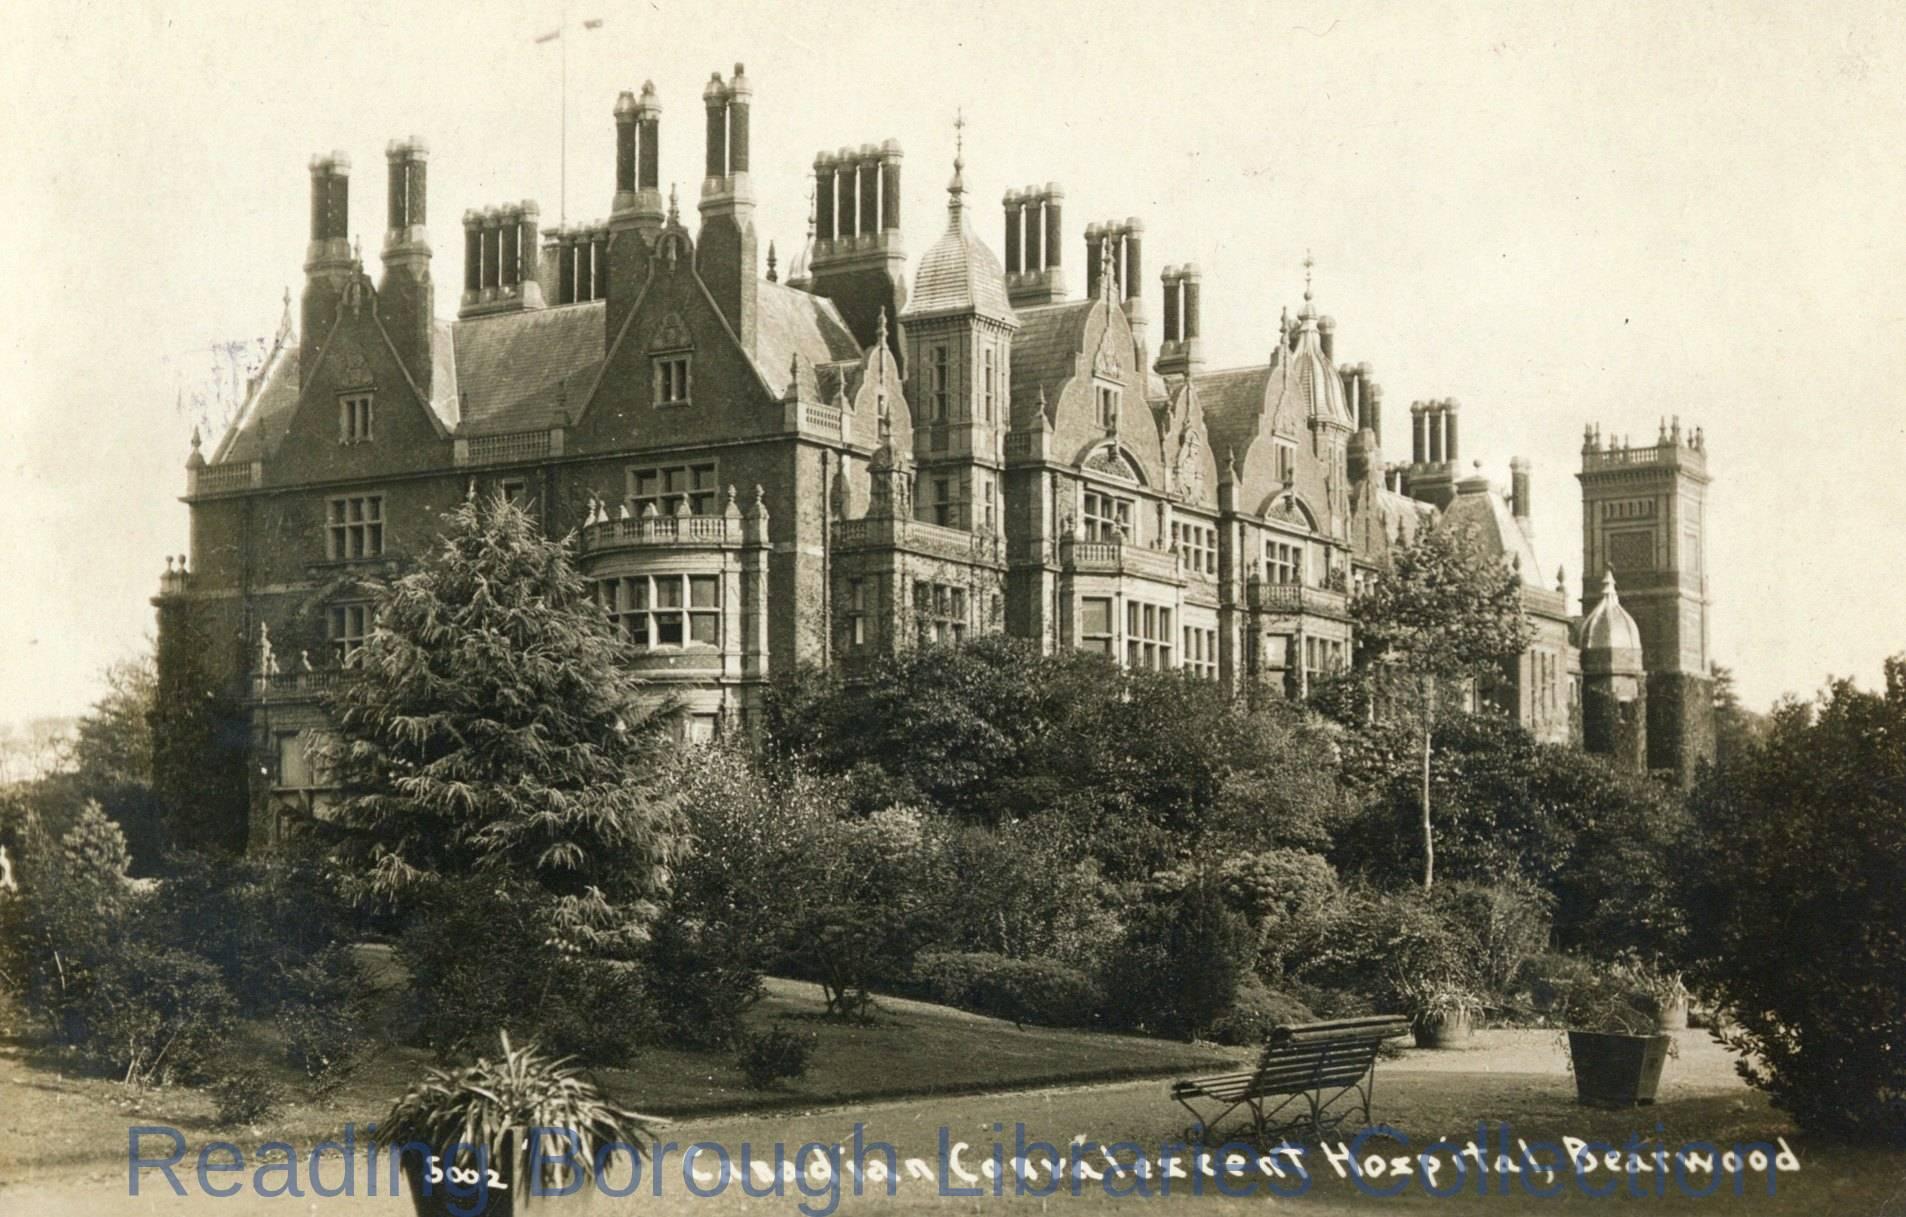 Canadian Convalescent Hospital, the House at Bear wood, Bearwood, 1910-1919.